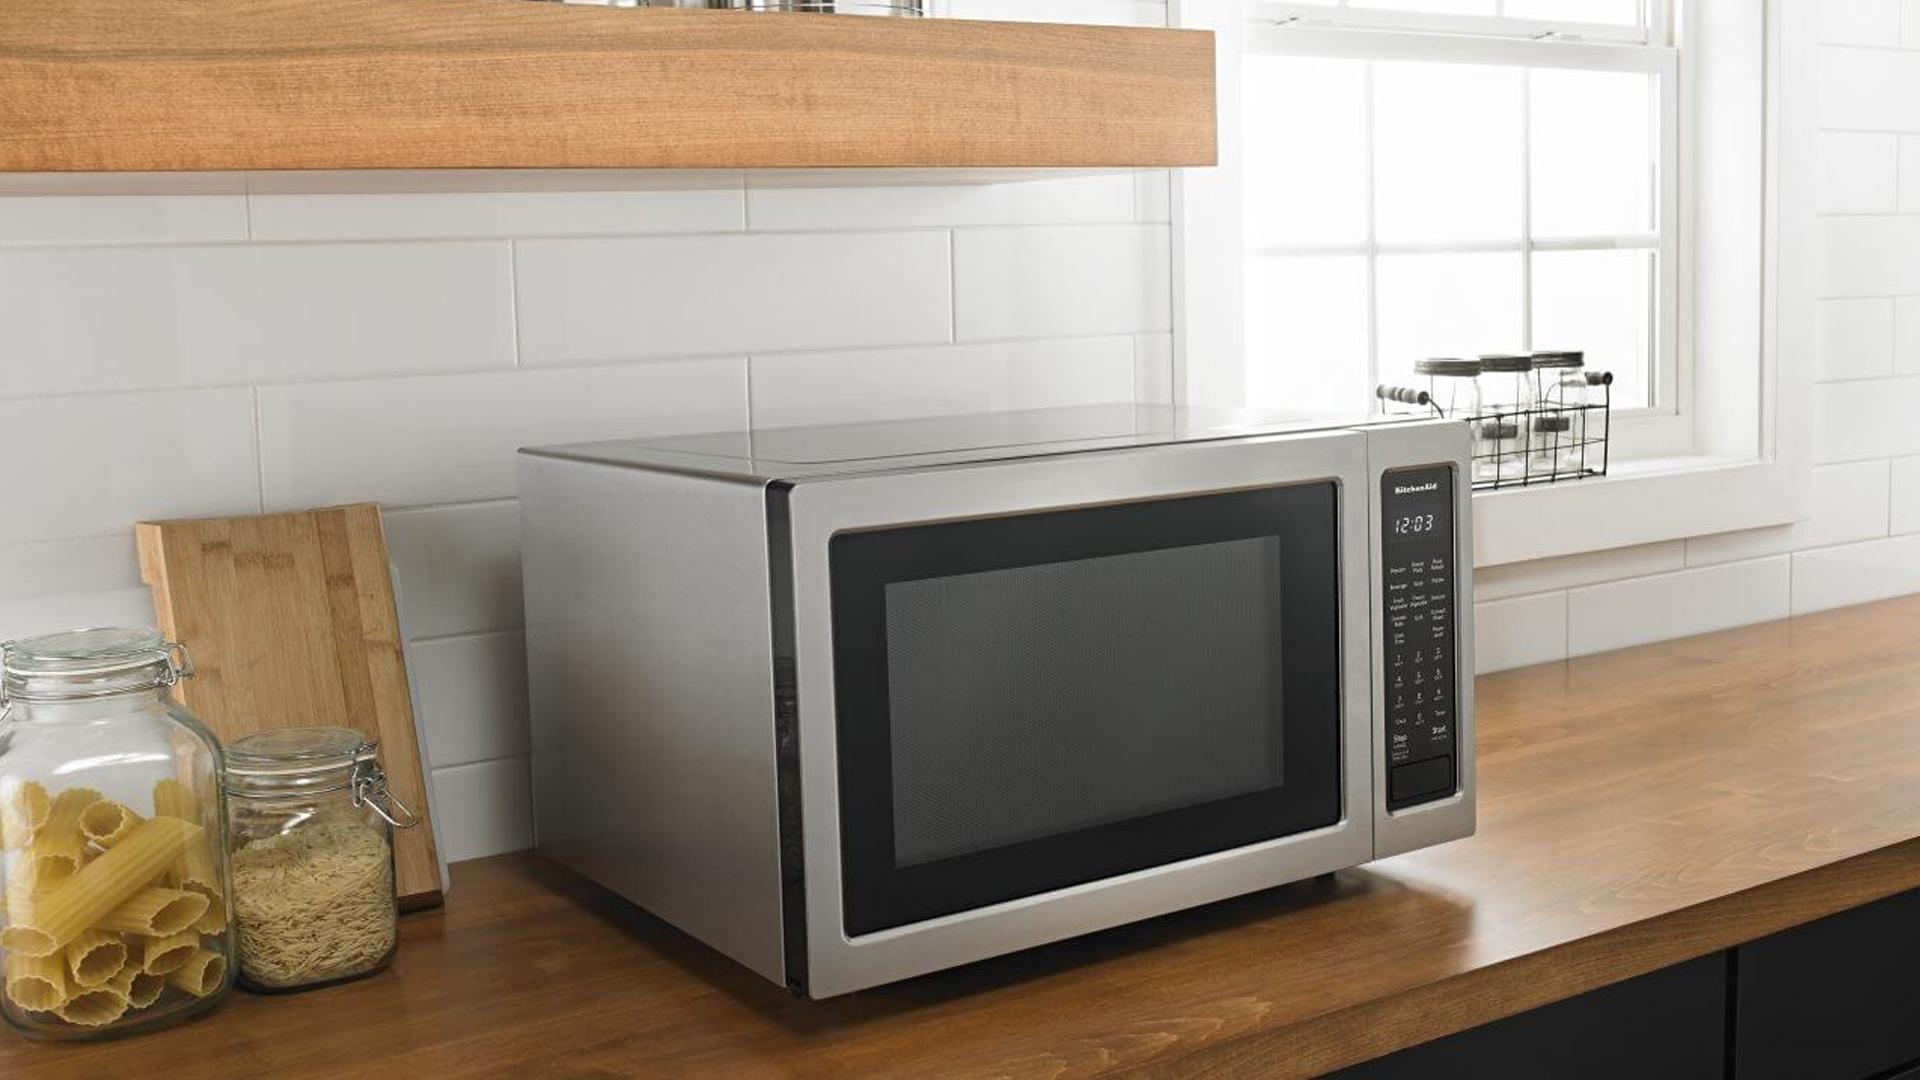 KitchenAid Countertop Microwave Repair | KitchenAid Repairs